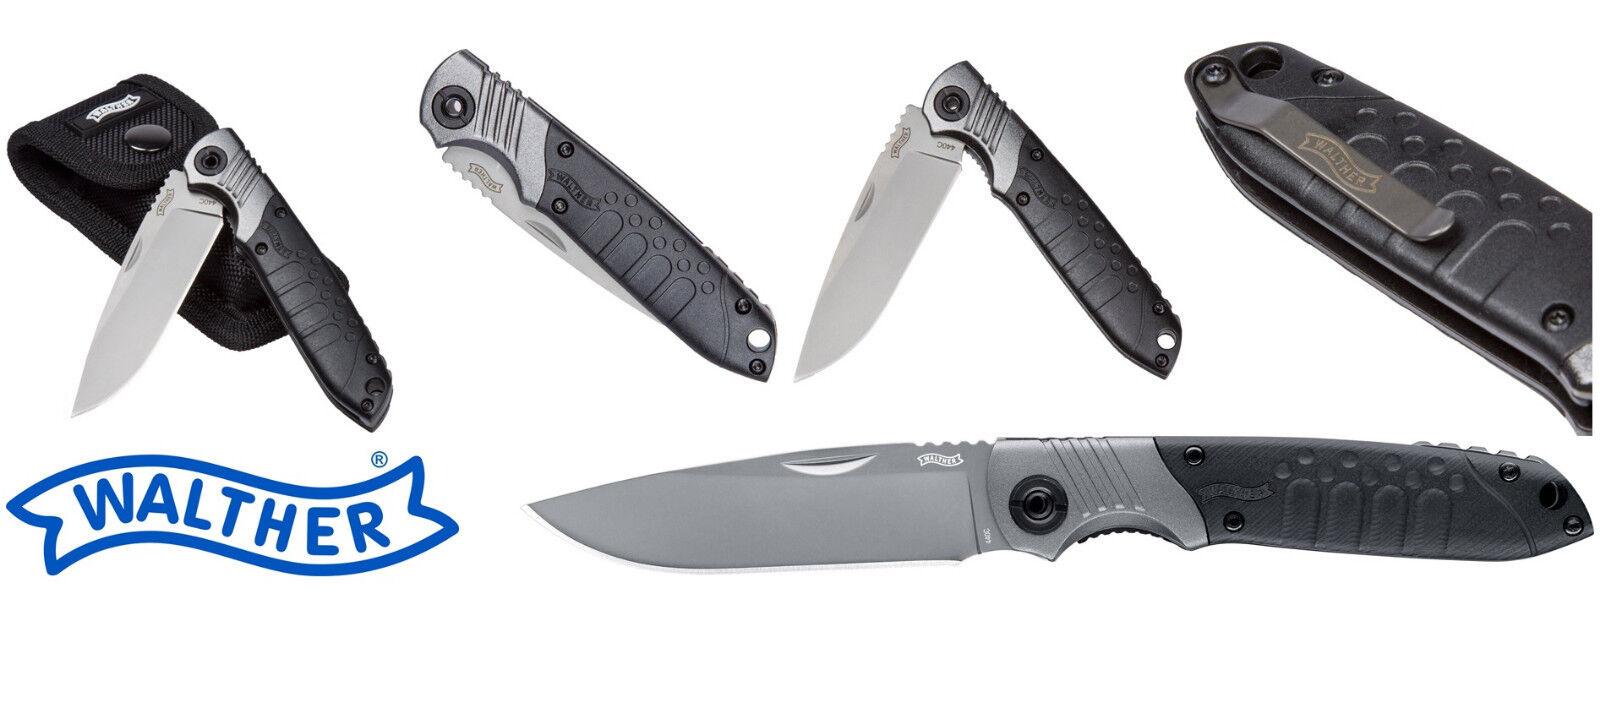 WALTHER 5.0718 5.0718 5.0718 MTK Messer Zange Bitset Etui + EDK 5.0775 Holster Clip Knife NEU 1353d0